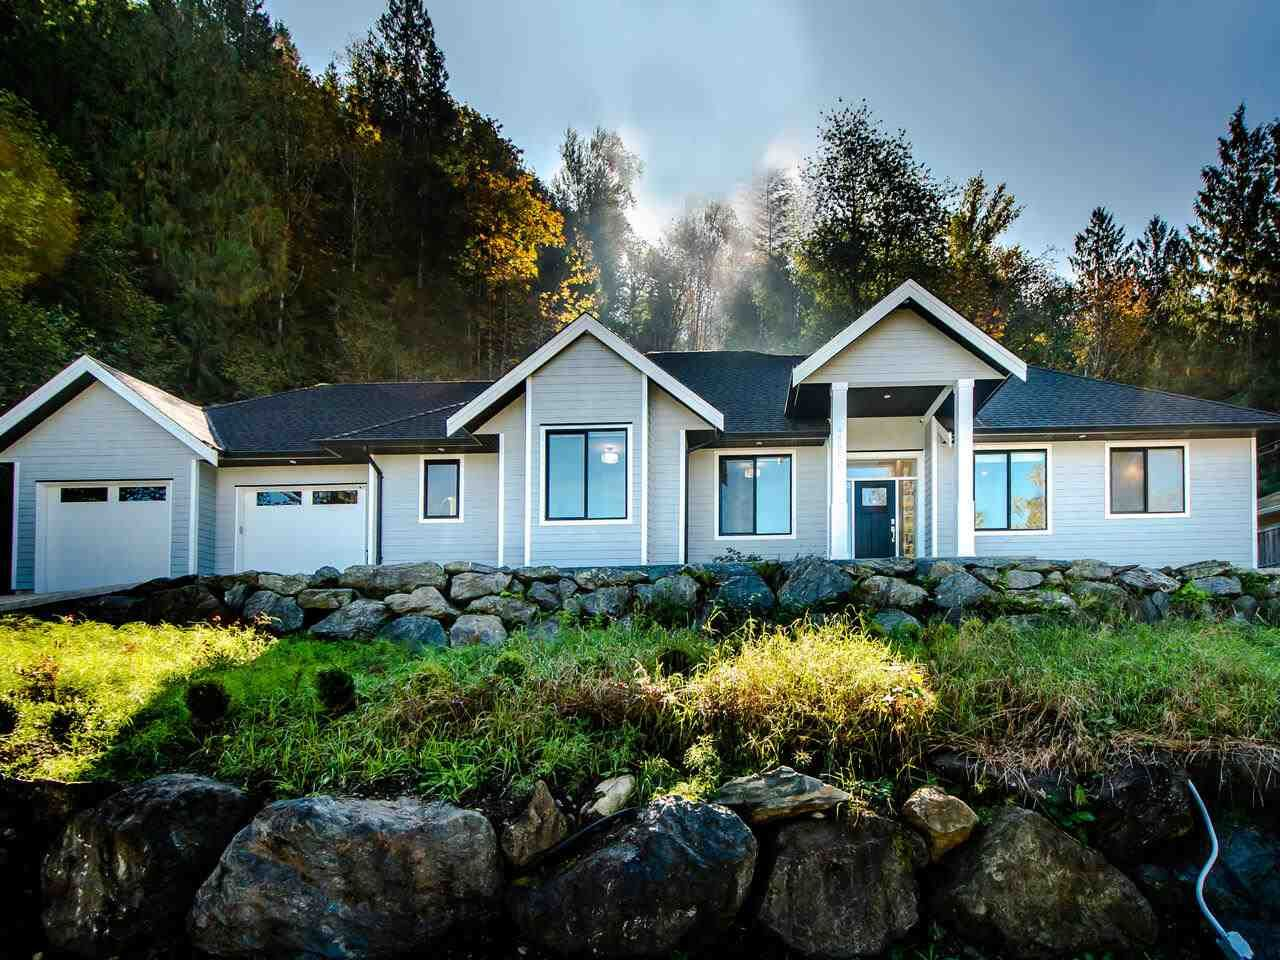 Main Photo: 45962 GURNEY Road: Cultus Lake House for sale : MLS®# R2506781